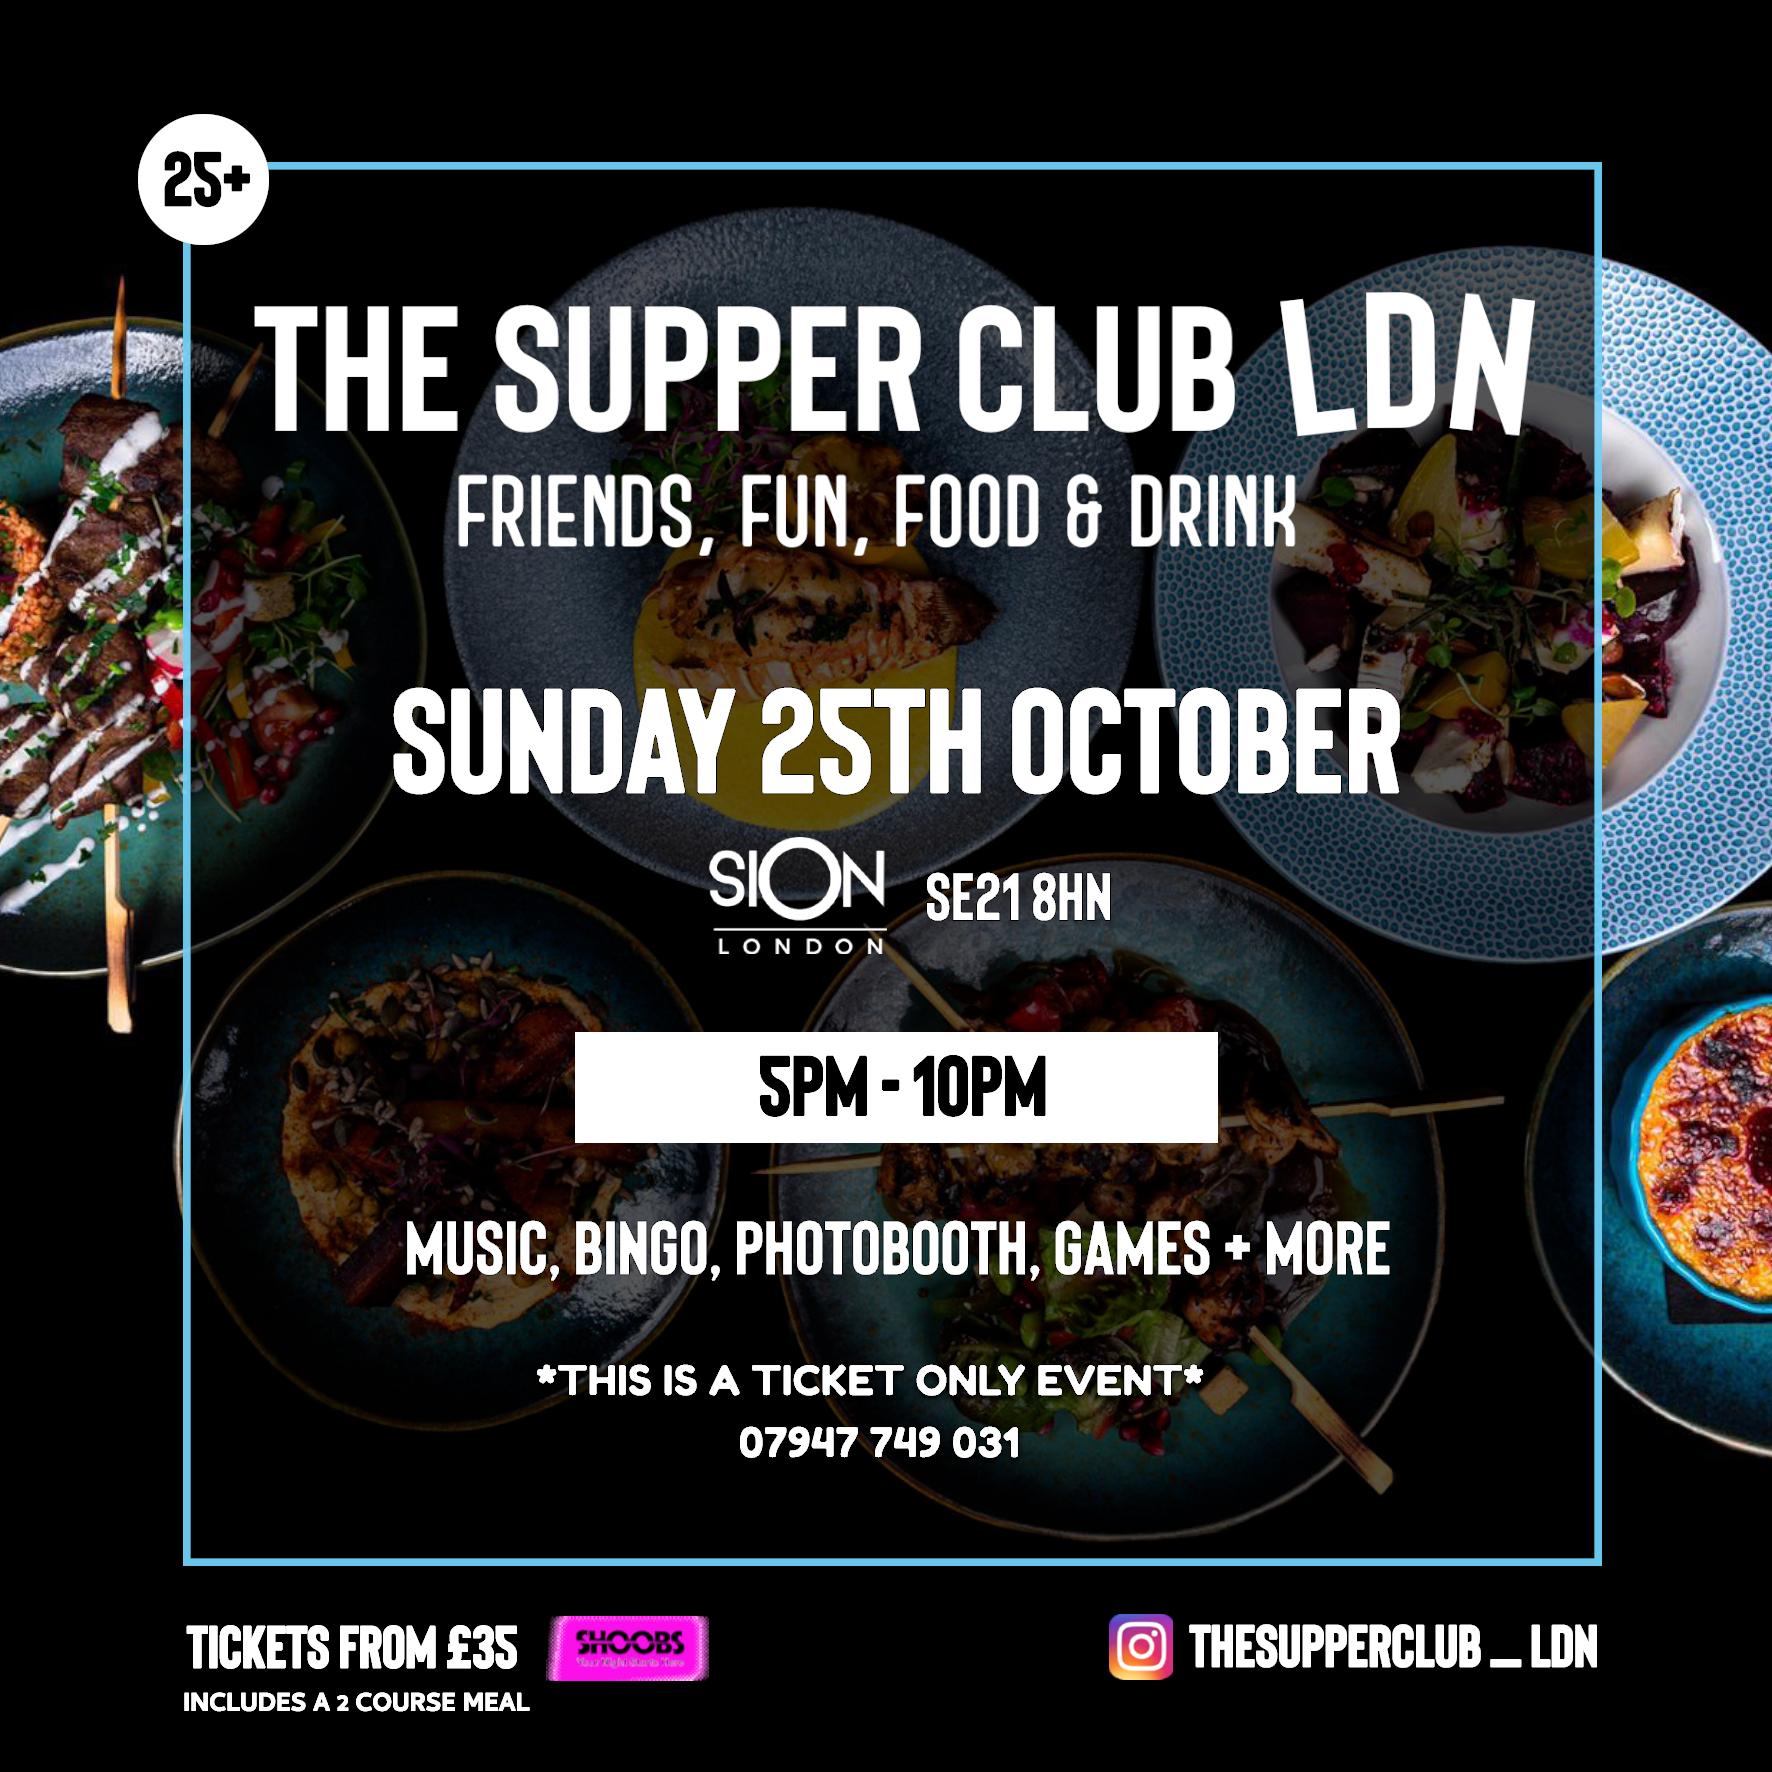 The Supper Club LDN - Sun OCT 25th (5pm-10pm)